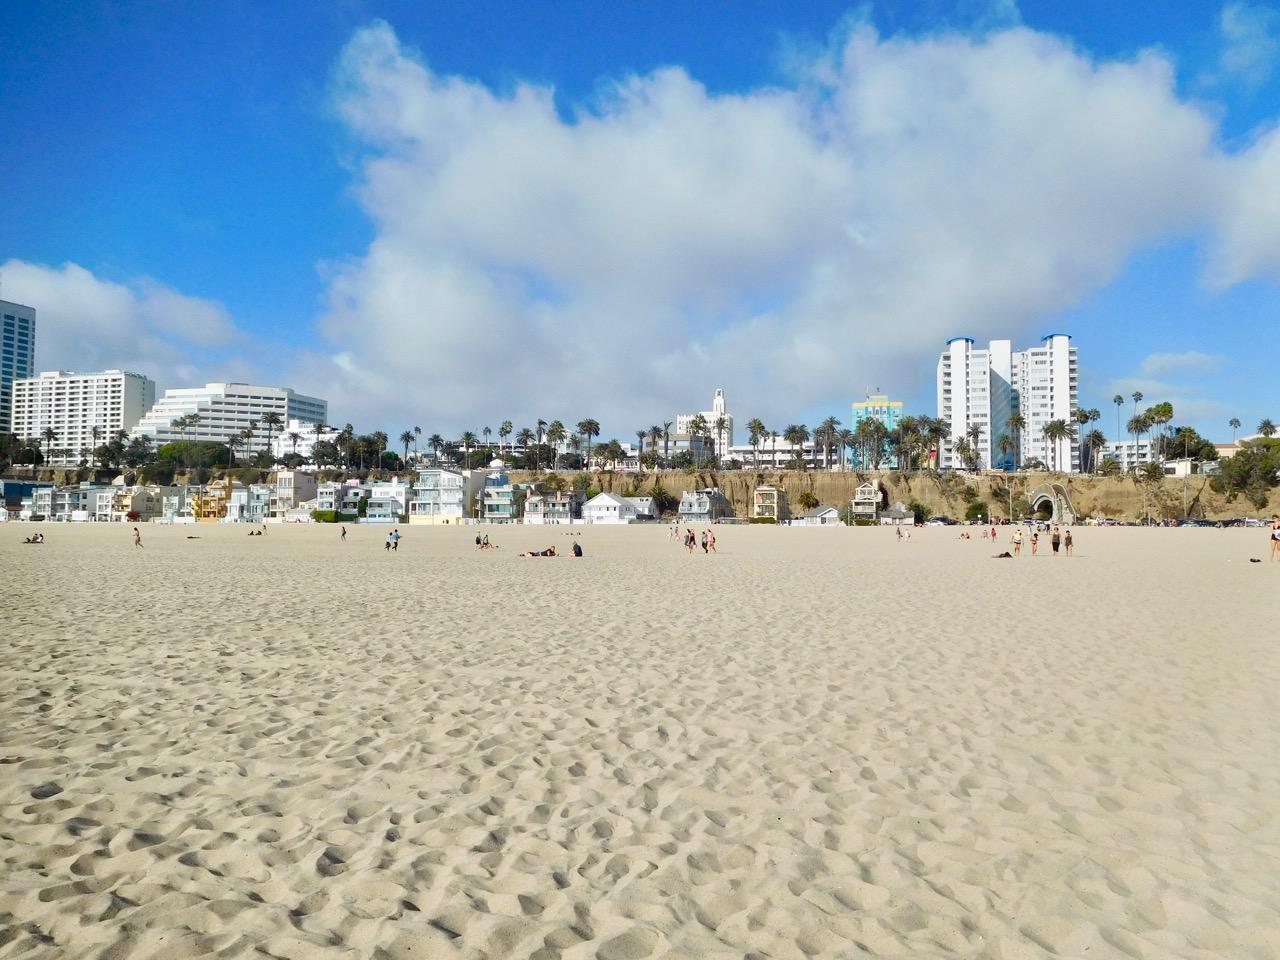 3 Days in L.A. - Santa Monica Beach (4)